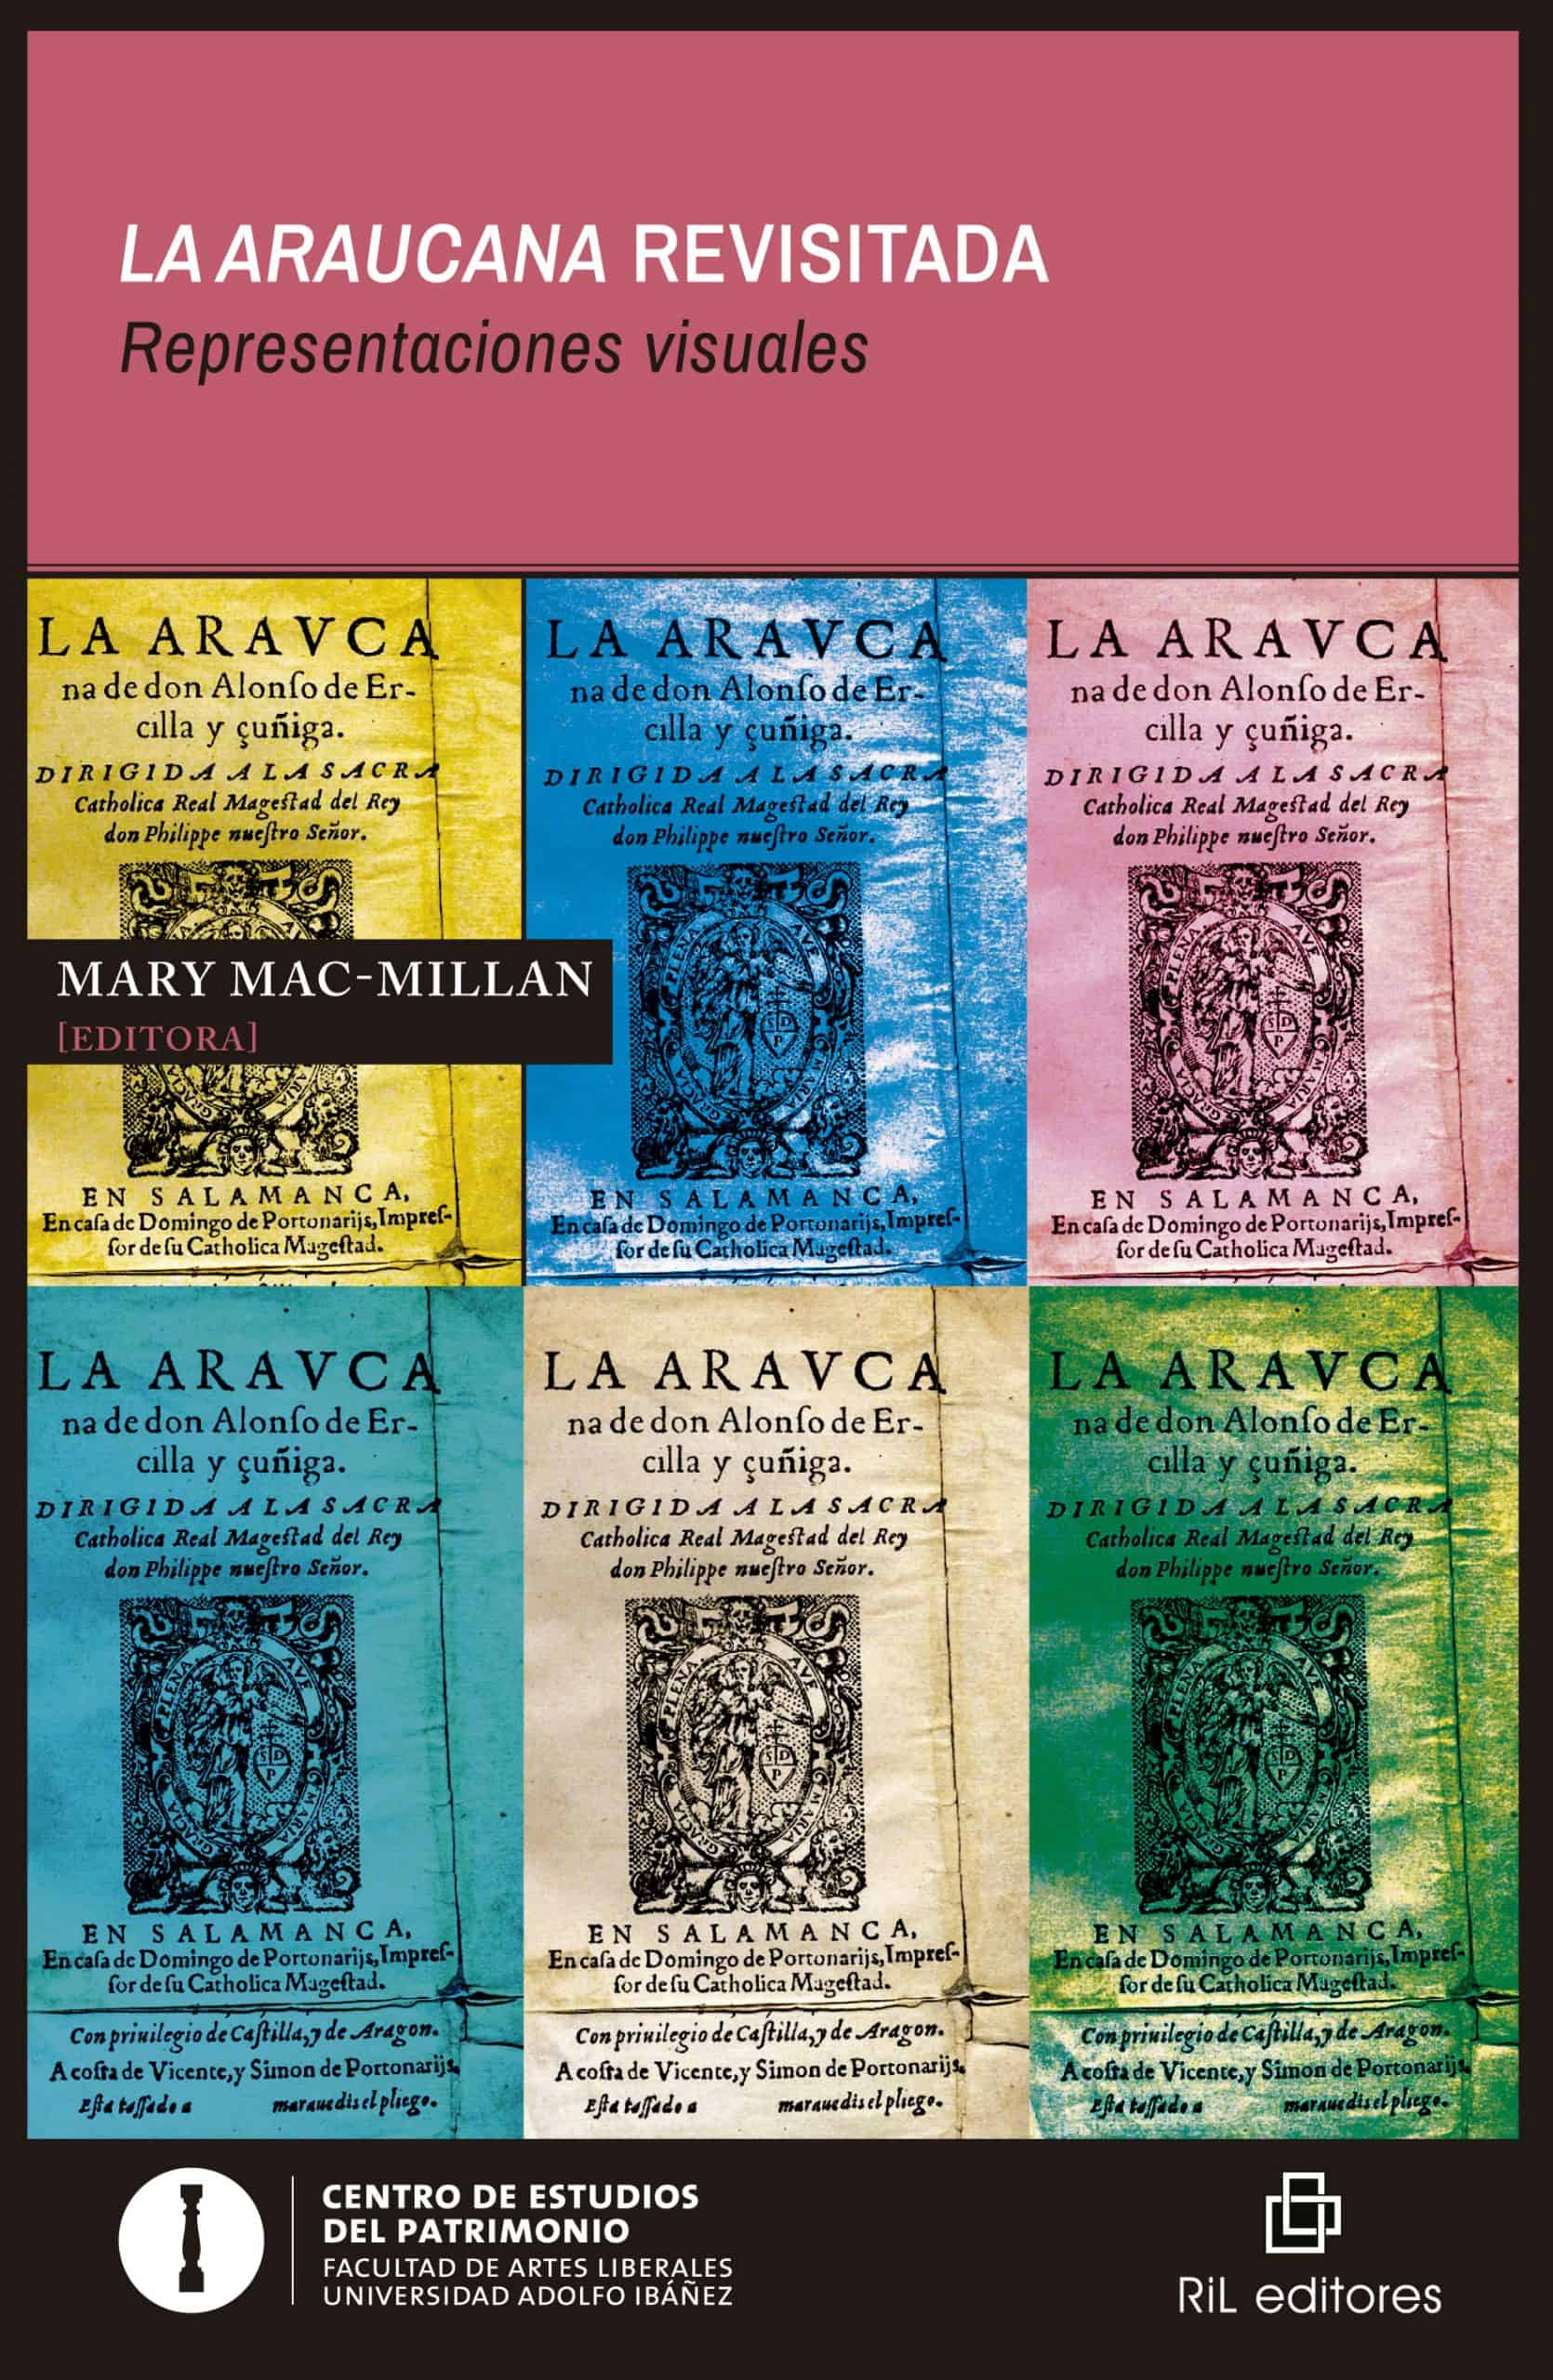 La Araucana revisitada: representaciones visuales 1